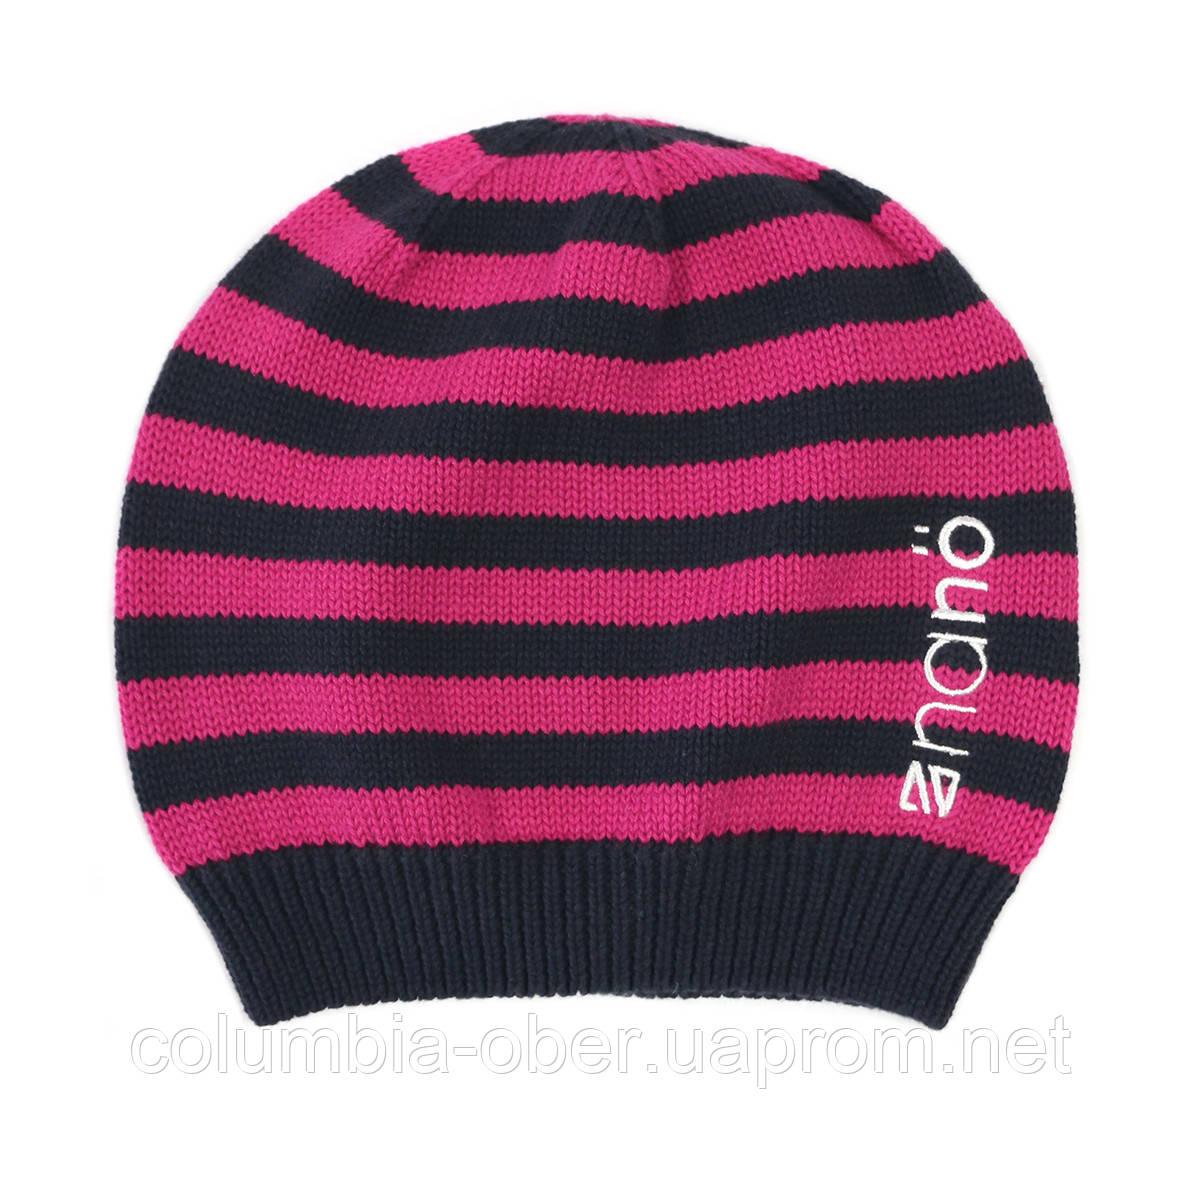 Демисезонная шапка для девочки NANO 254 TUT S17 Flower. Размер 2/4х - 7/12.